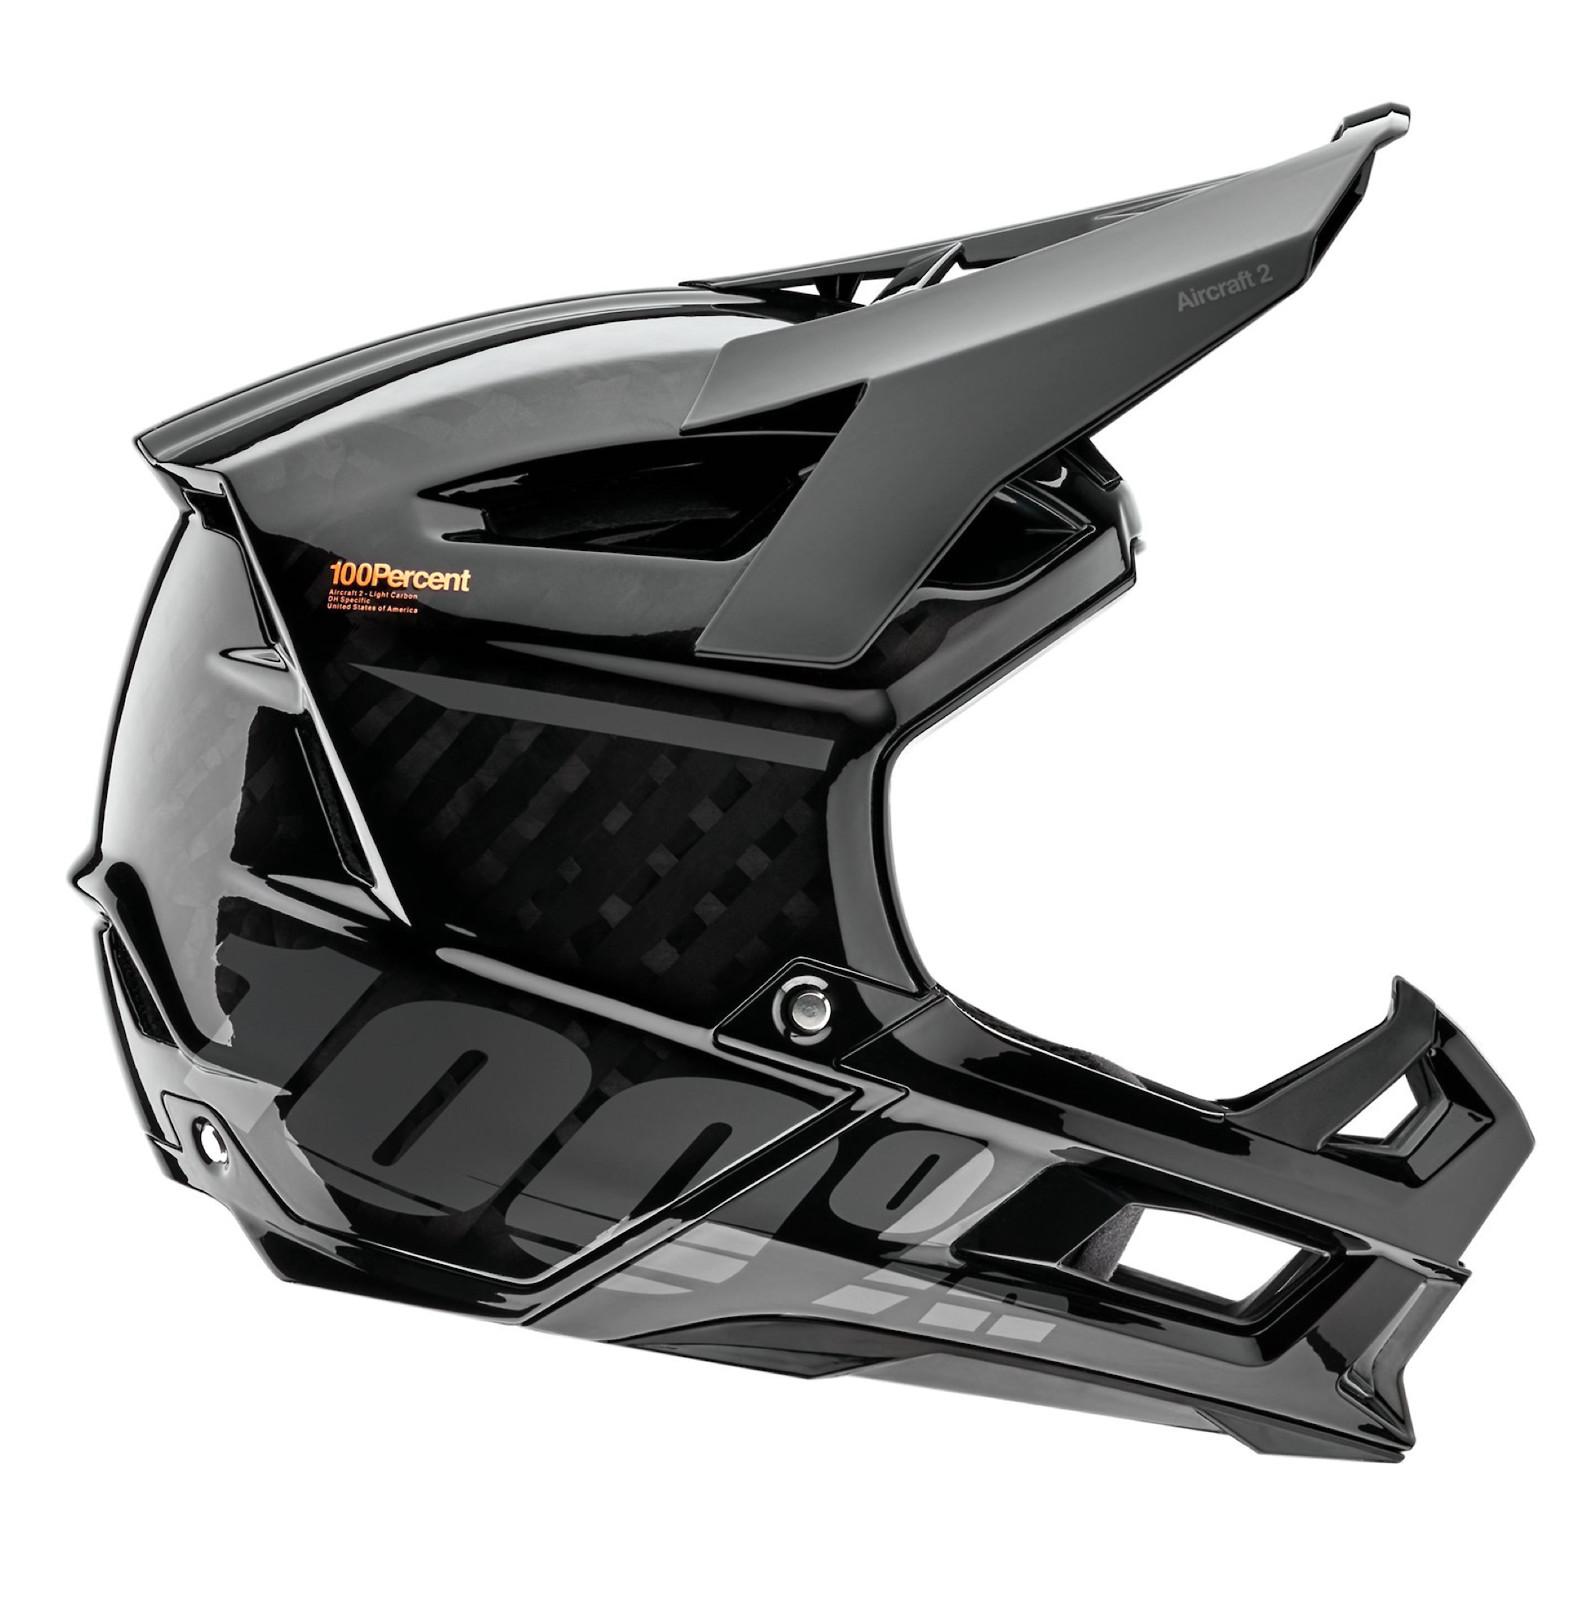 AIRCRAFT 2 Helmet (Black)